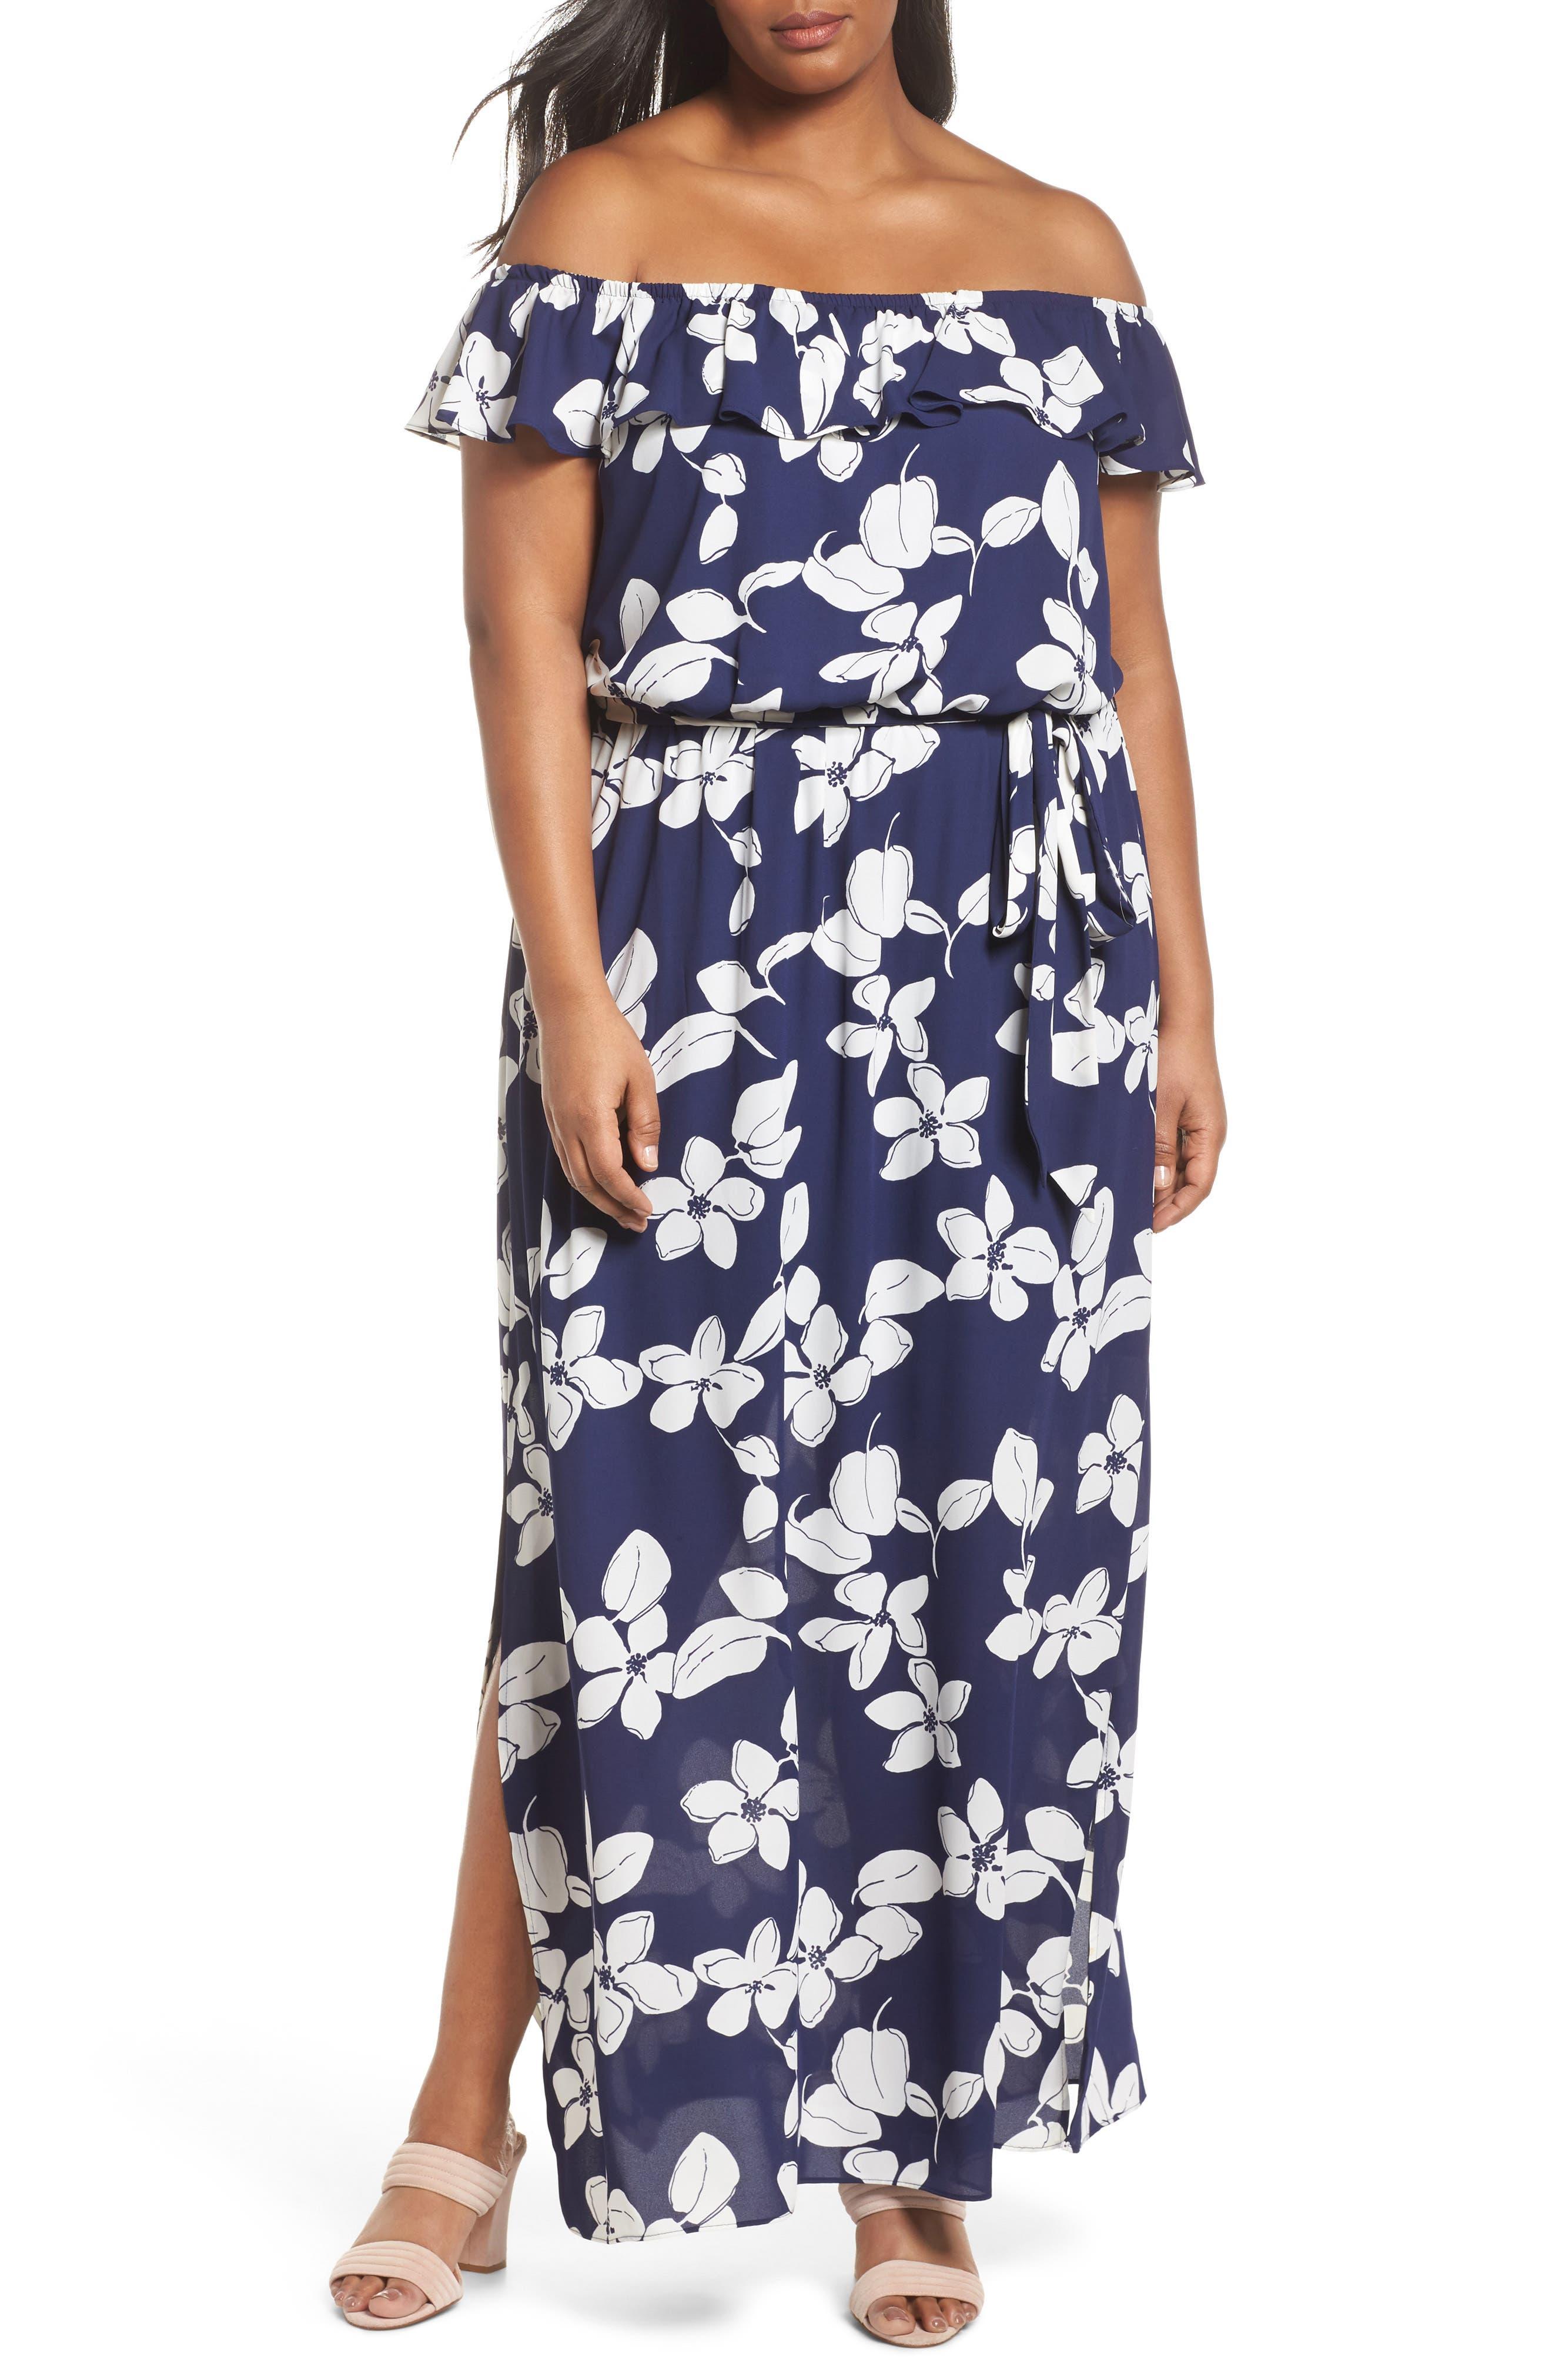 ADRIANNA PAPELL,                             Simple Delight Ruffle Maxi Dress,                             Main thumbnail 1, color,                             480